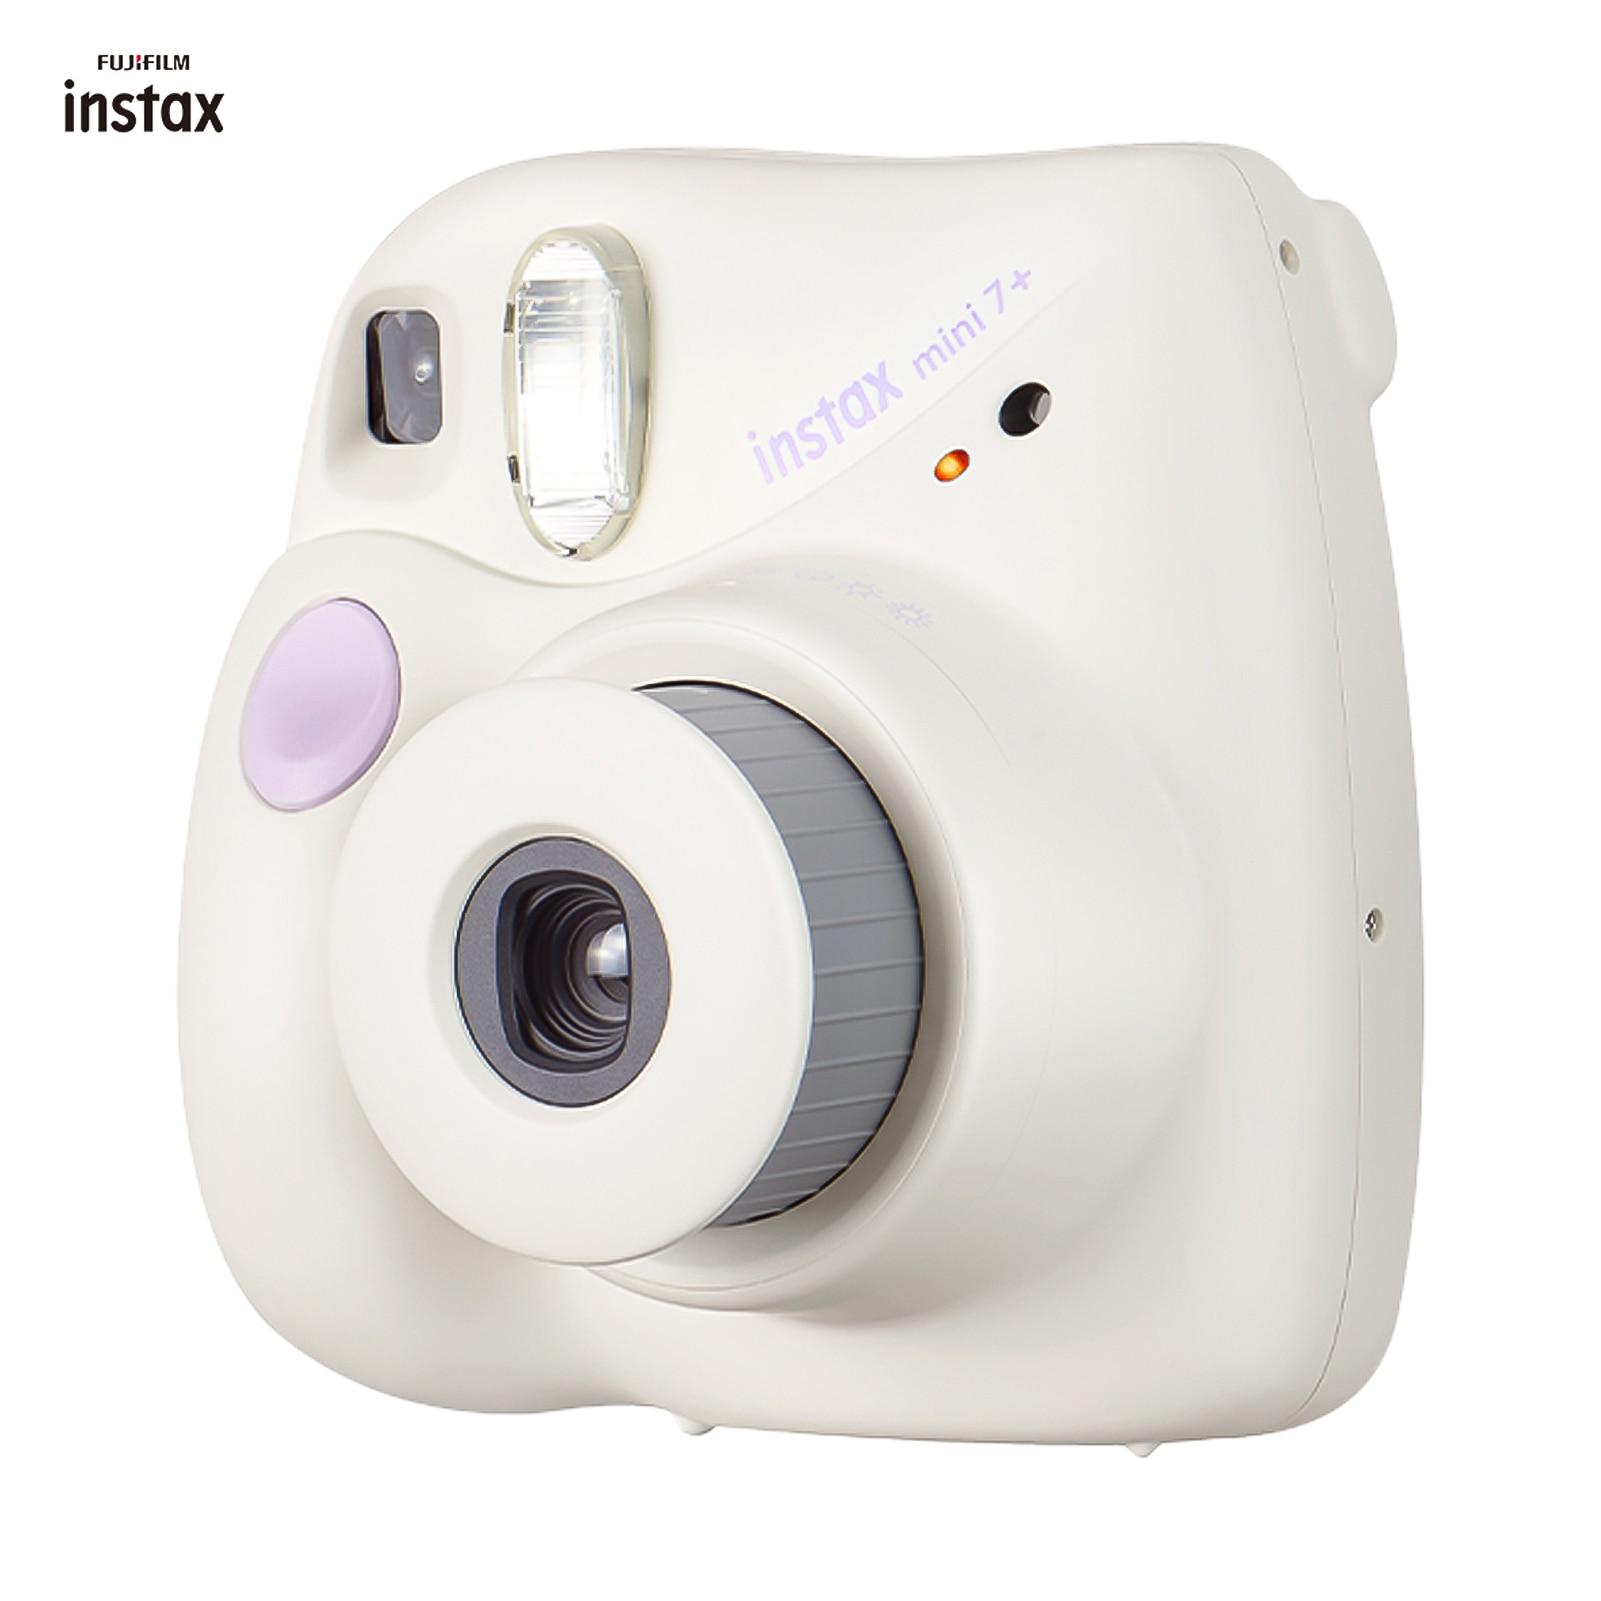 Fujifilm Instax Mini Film 7+ Instant Camera Cam Auto-focusing with Wrist Strap Birthday Festival Gift Photo Studio Photography